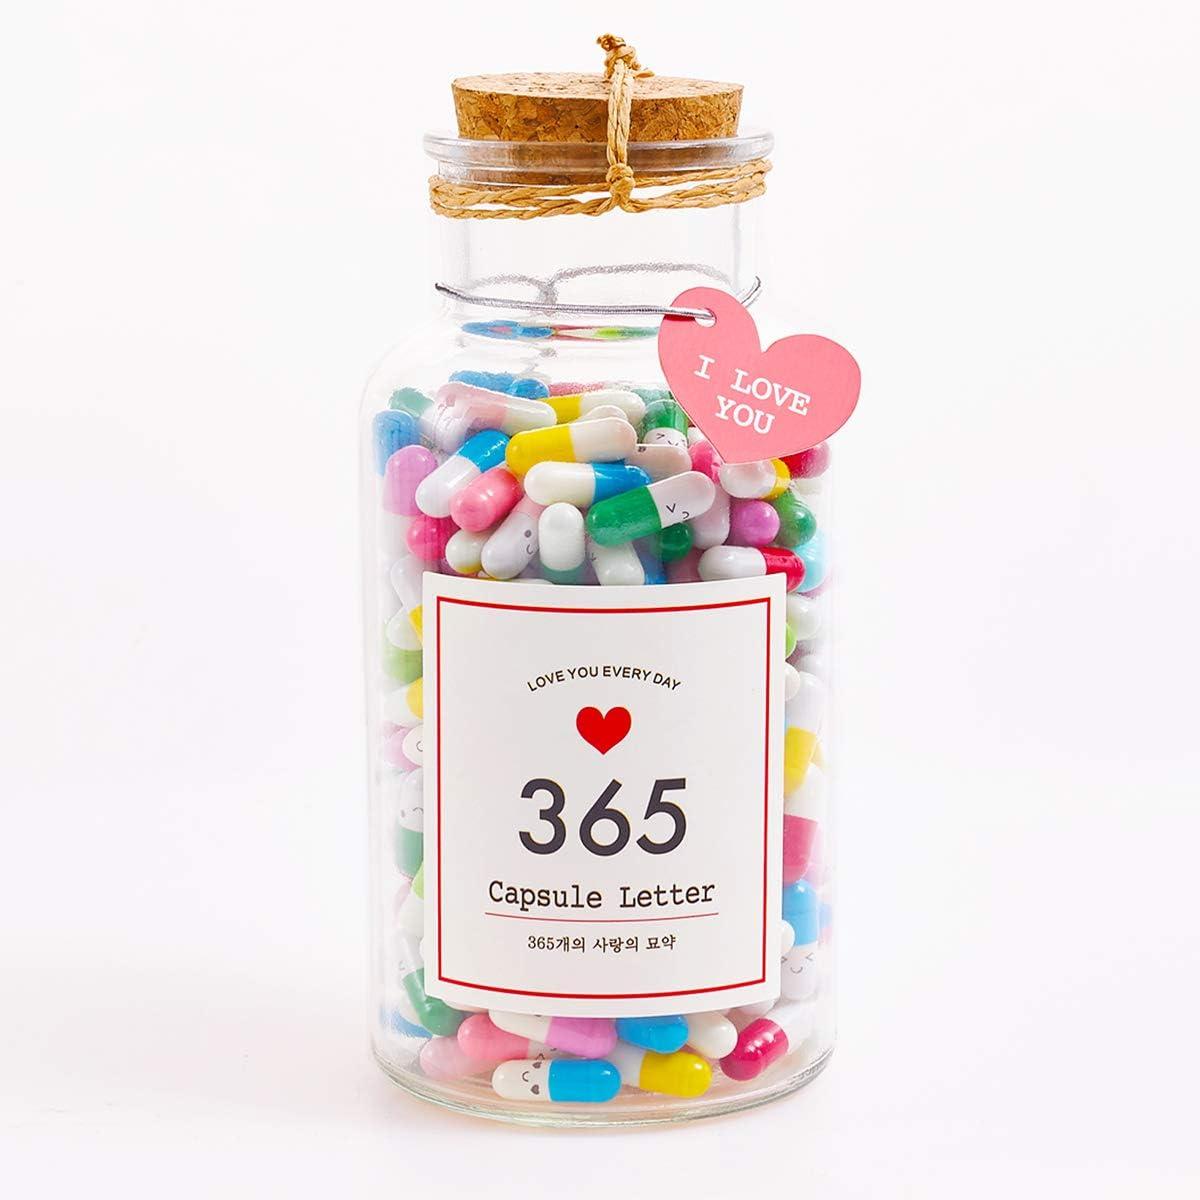 365 Pcs Gift For Boyfriend In A Bottle Capsule Letter Message Pill Love Letter For Boyfriend Or Girlfriend Assorted Colours Amazon De Baumarkt